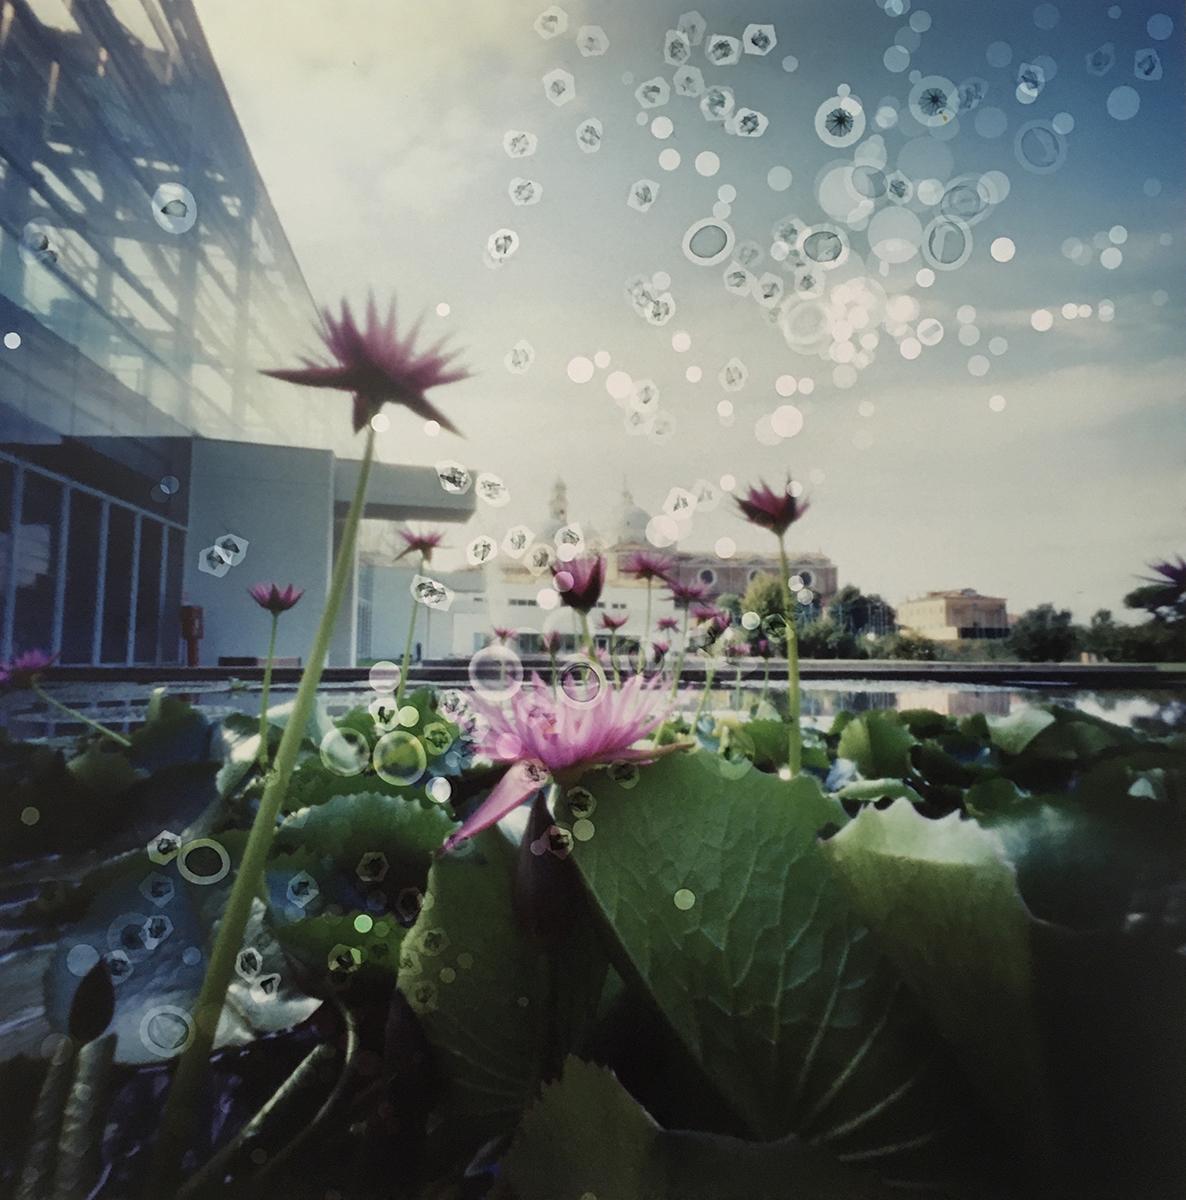 Biodiversity Garden, Padua, Italy (lily pond) (2019)